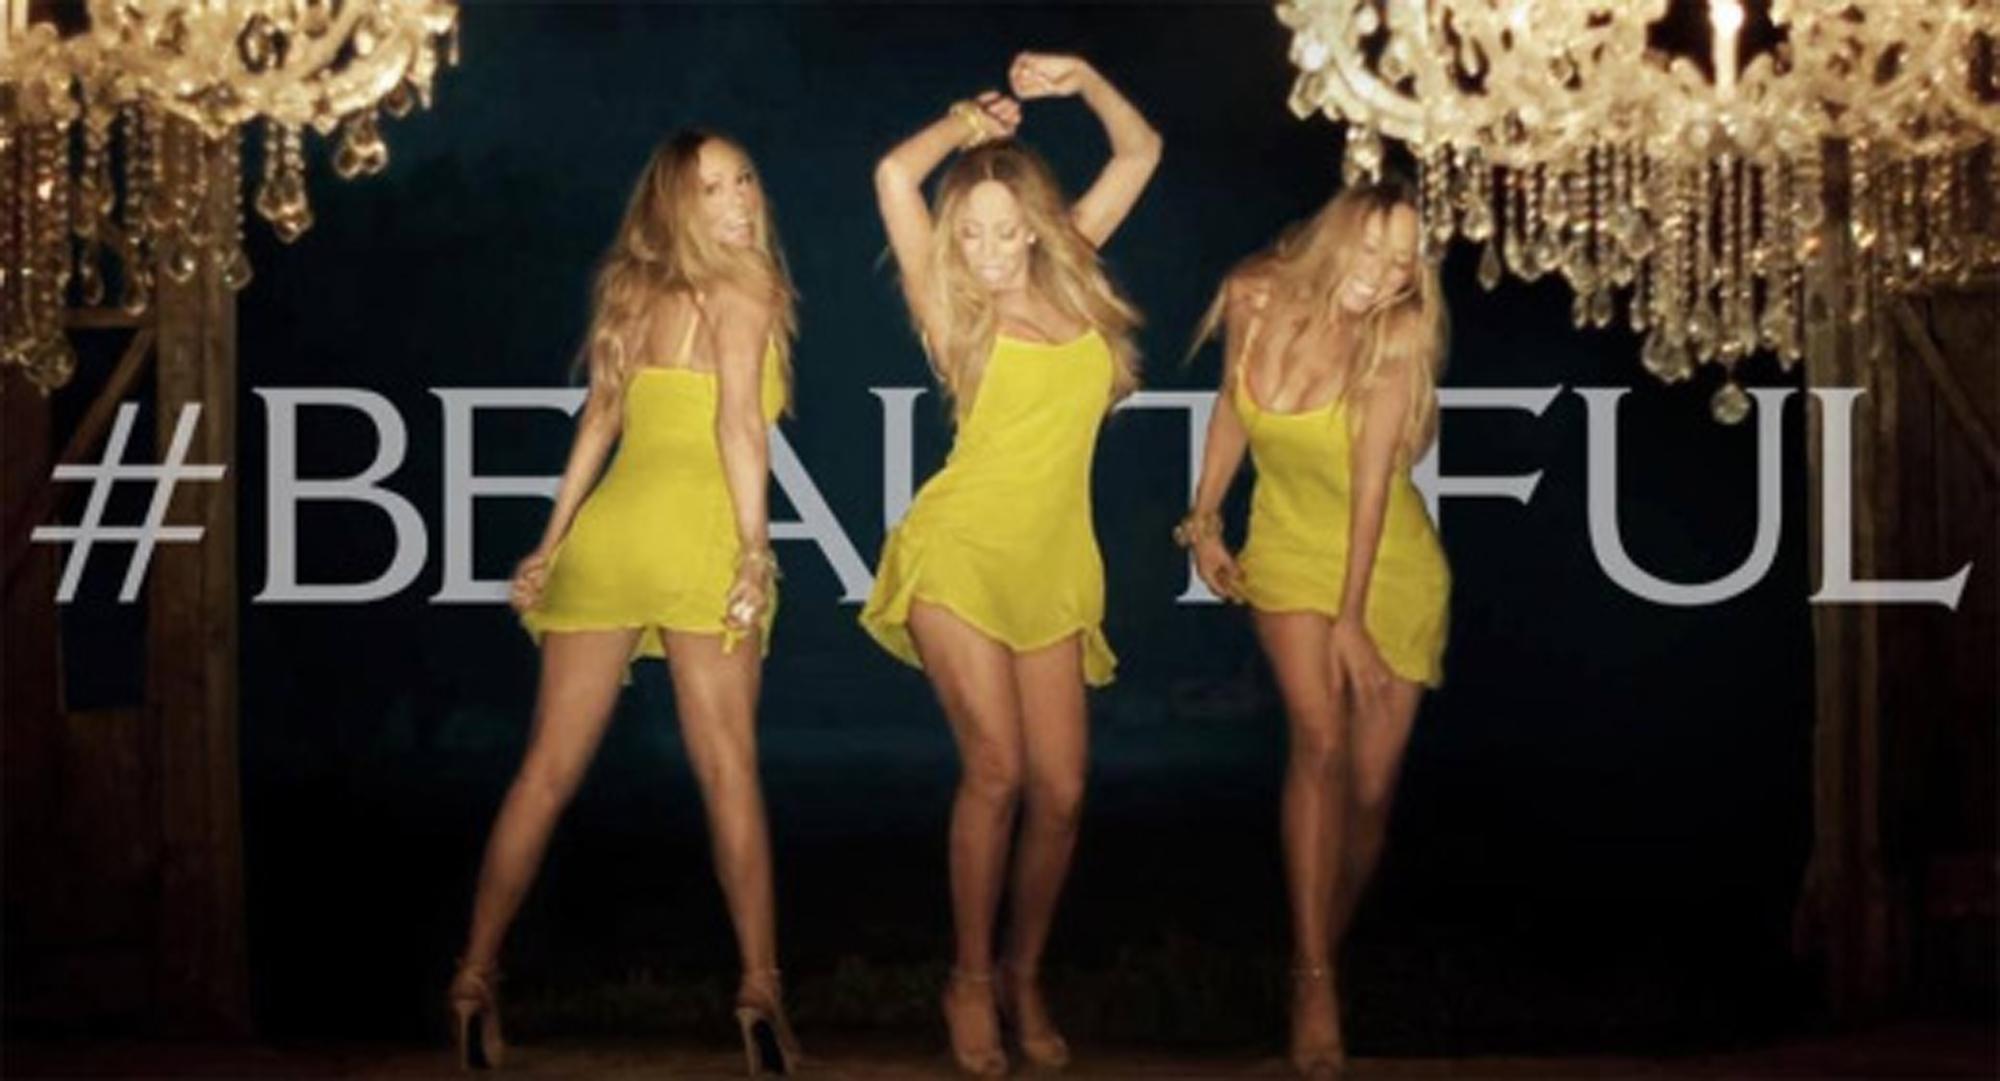 Mariah Carey ft. Miguel Ð Ò#Beautiful (Explicit Version)Ó Vevo